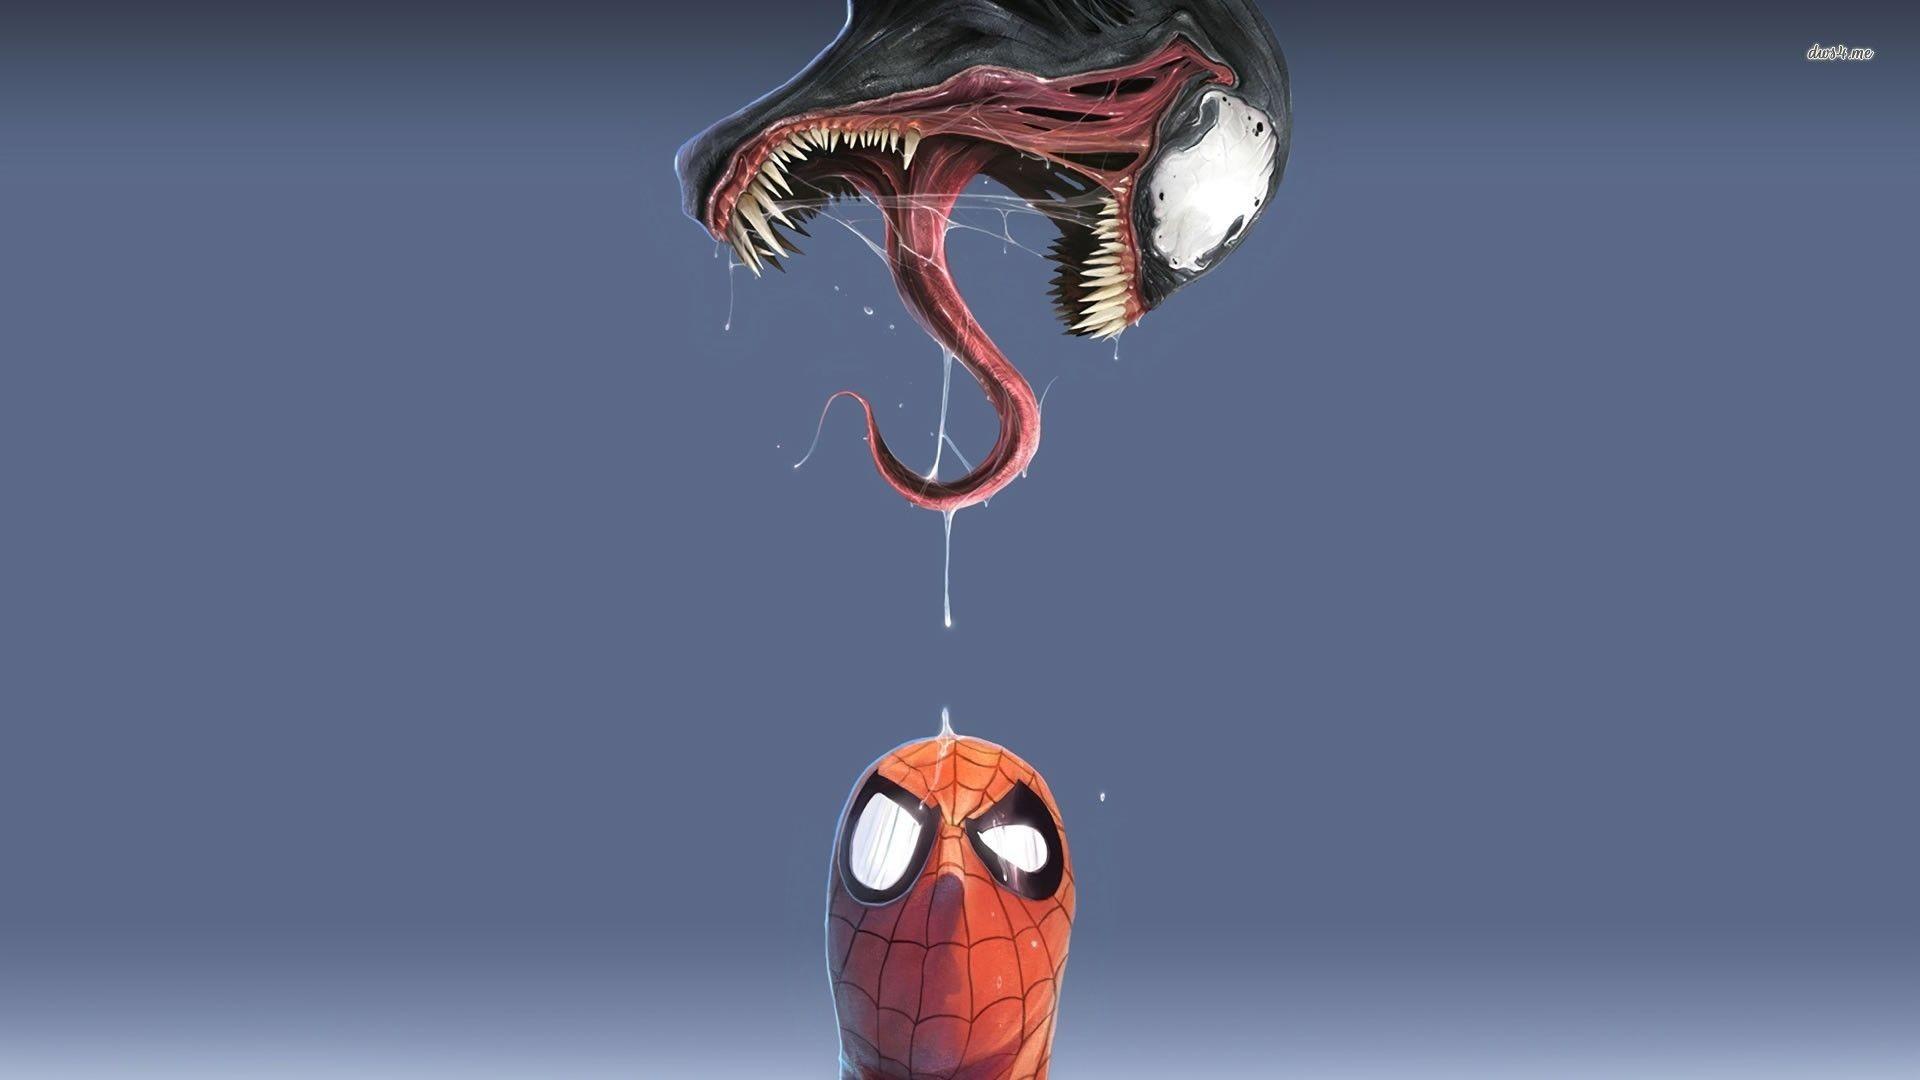 Venom vs Spider-Man wallpaper – Comic wallpapers – #10764